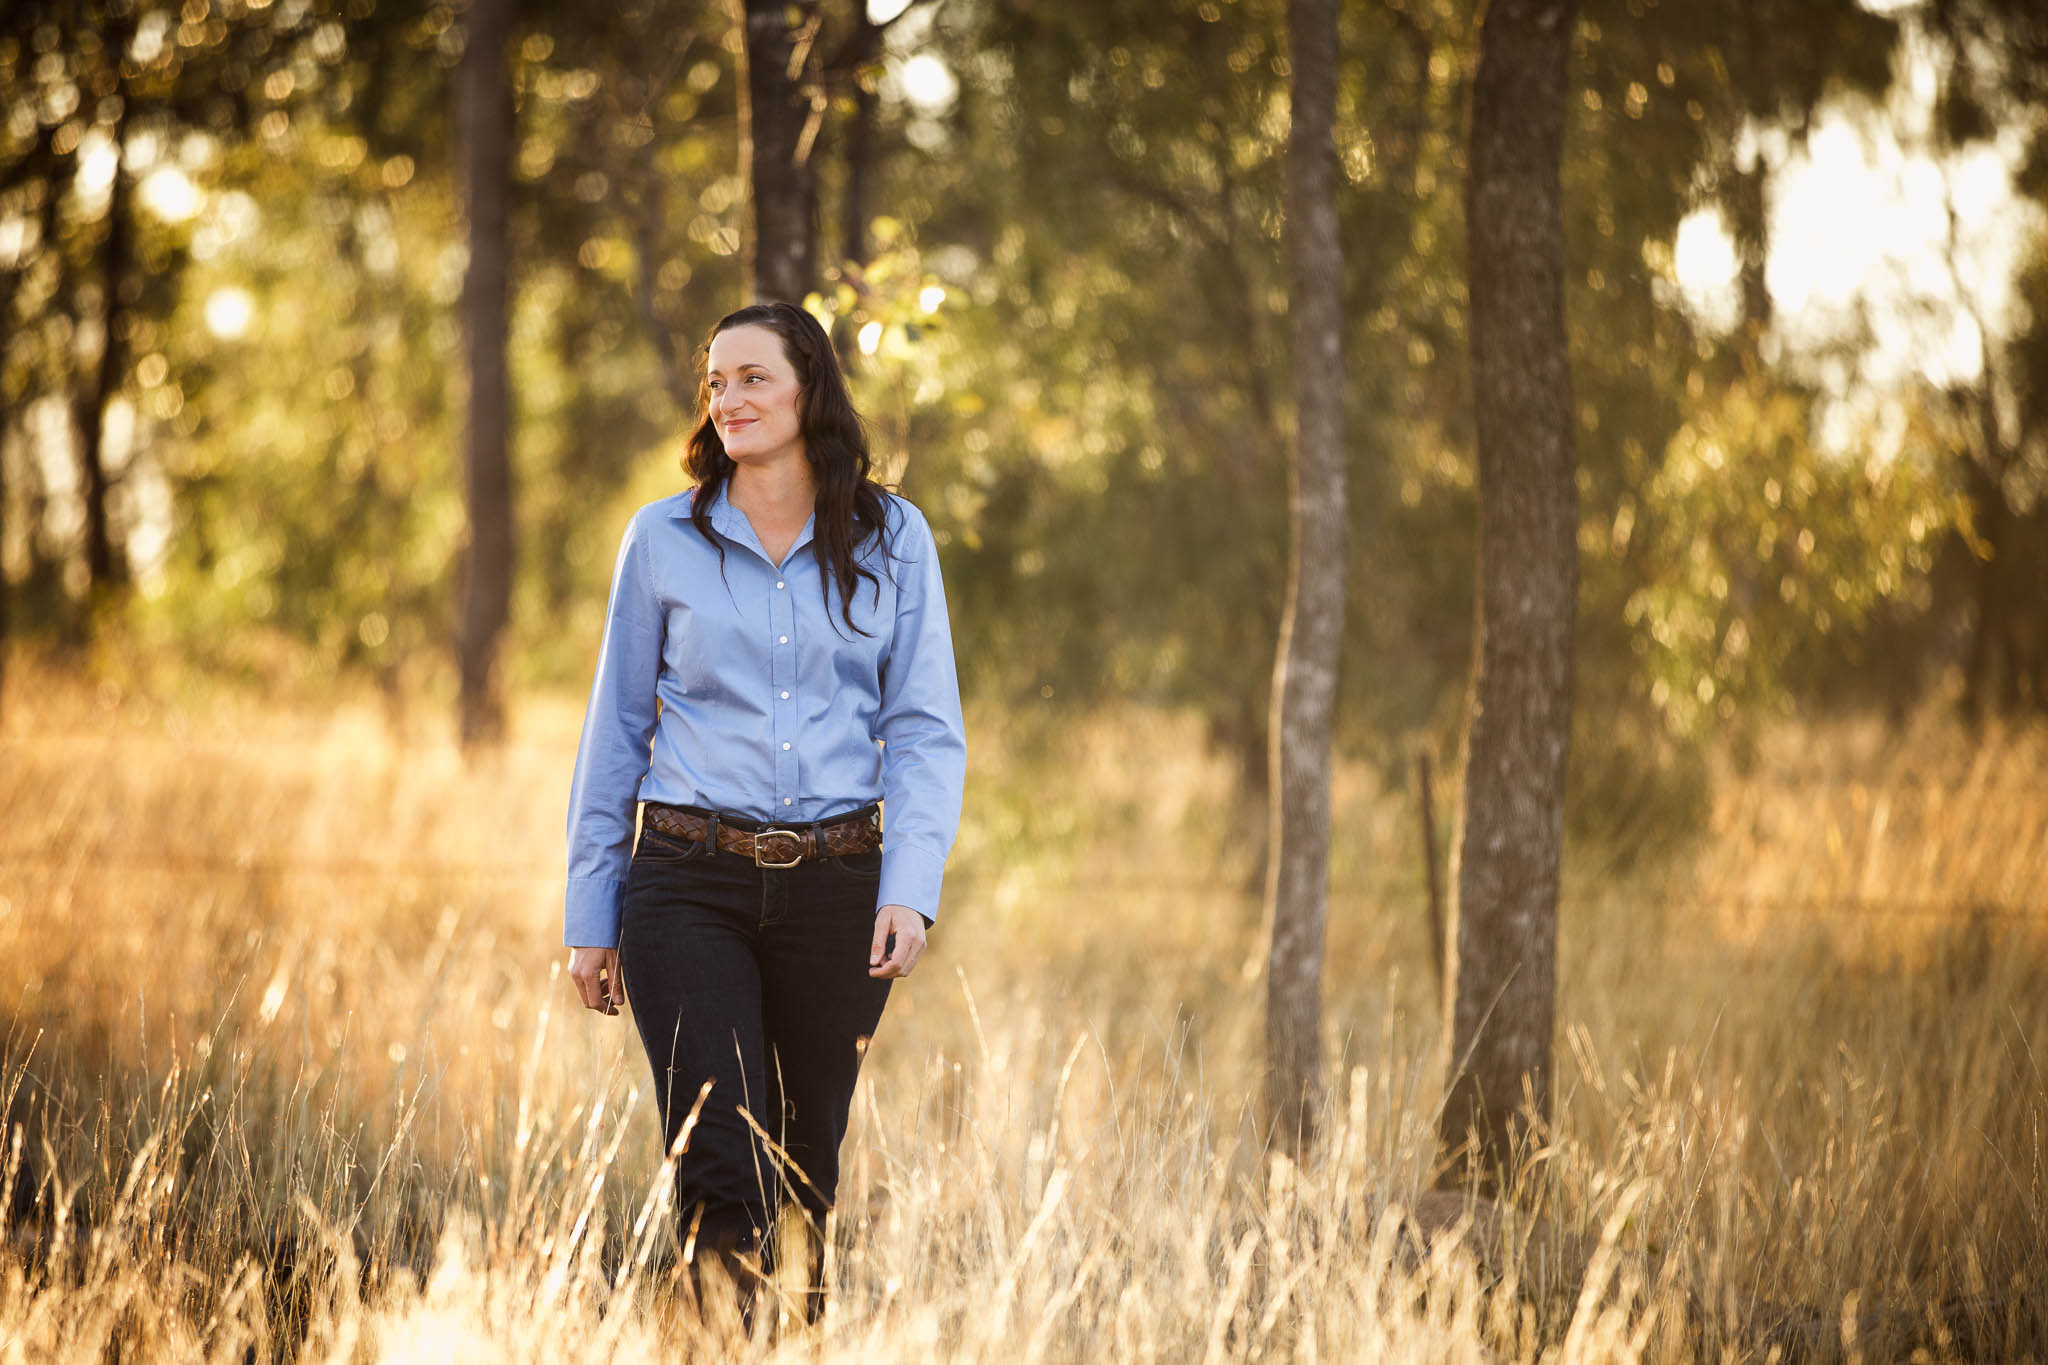 Susan Jacobs Photography_Janine Milne_Personal Branding_Web Ready-20.jpg